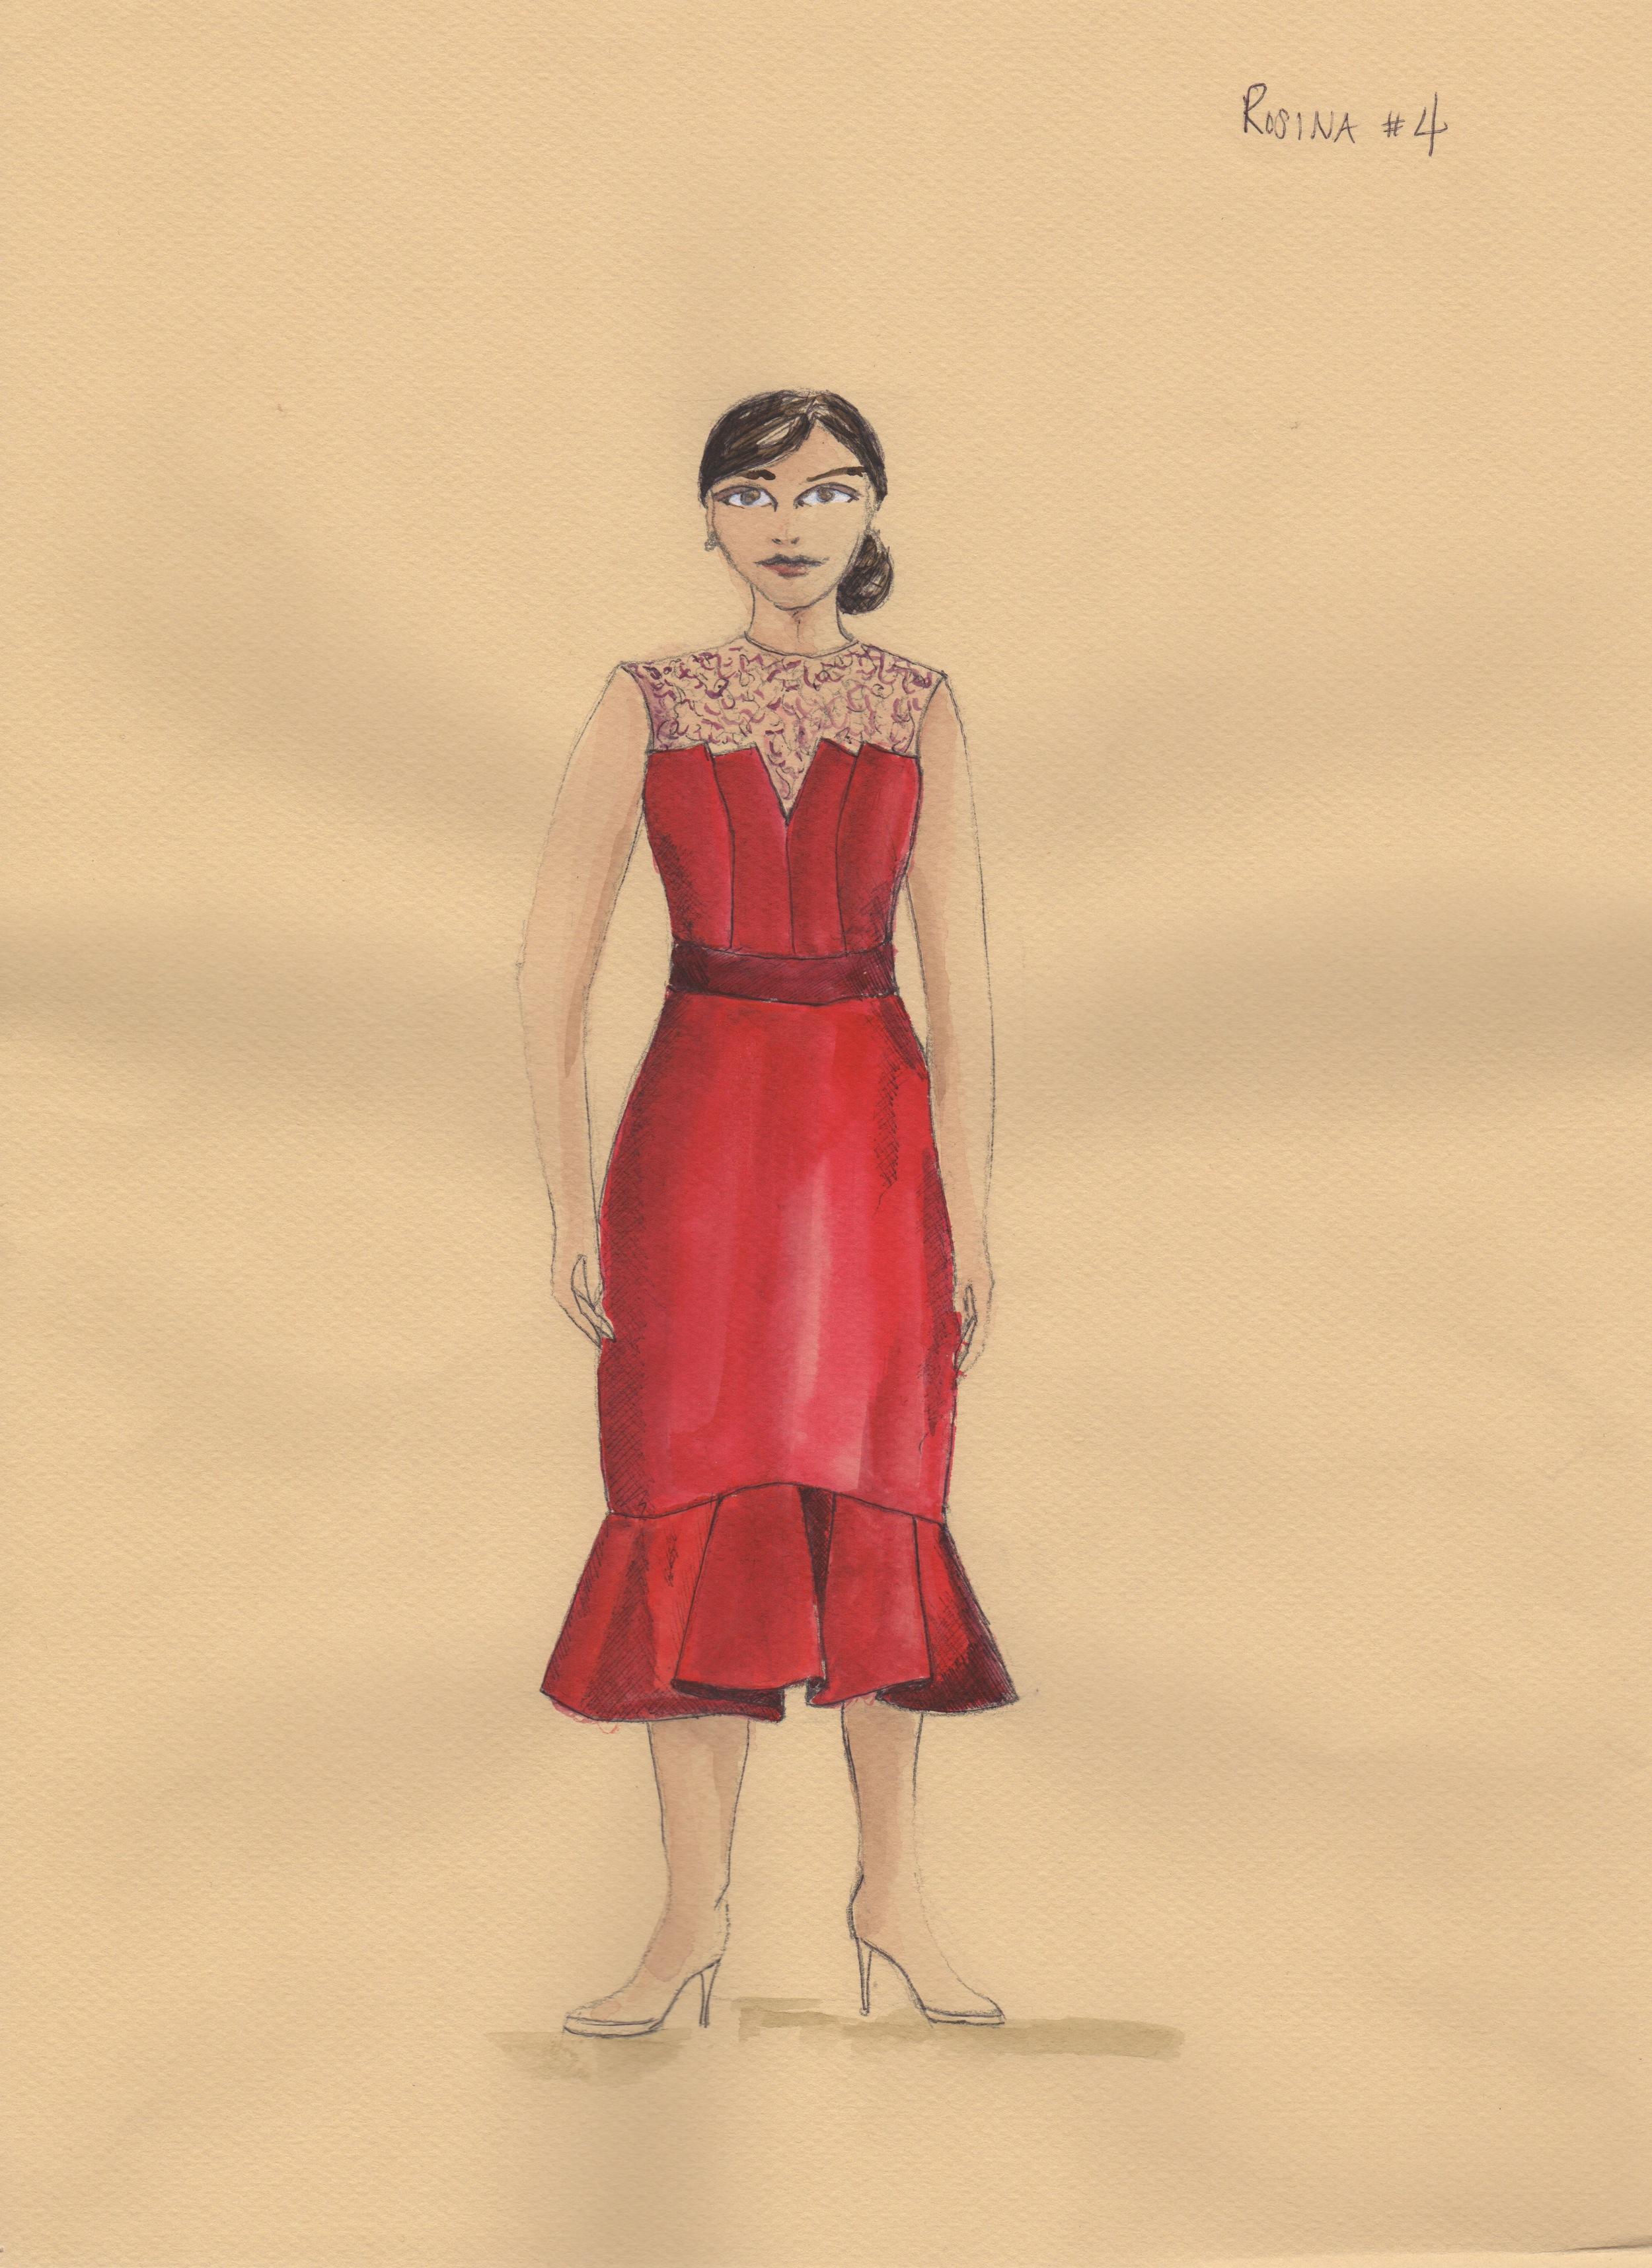 Rosina #4.jpeg